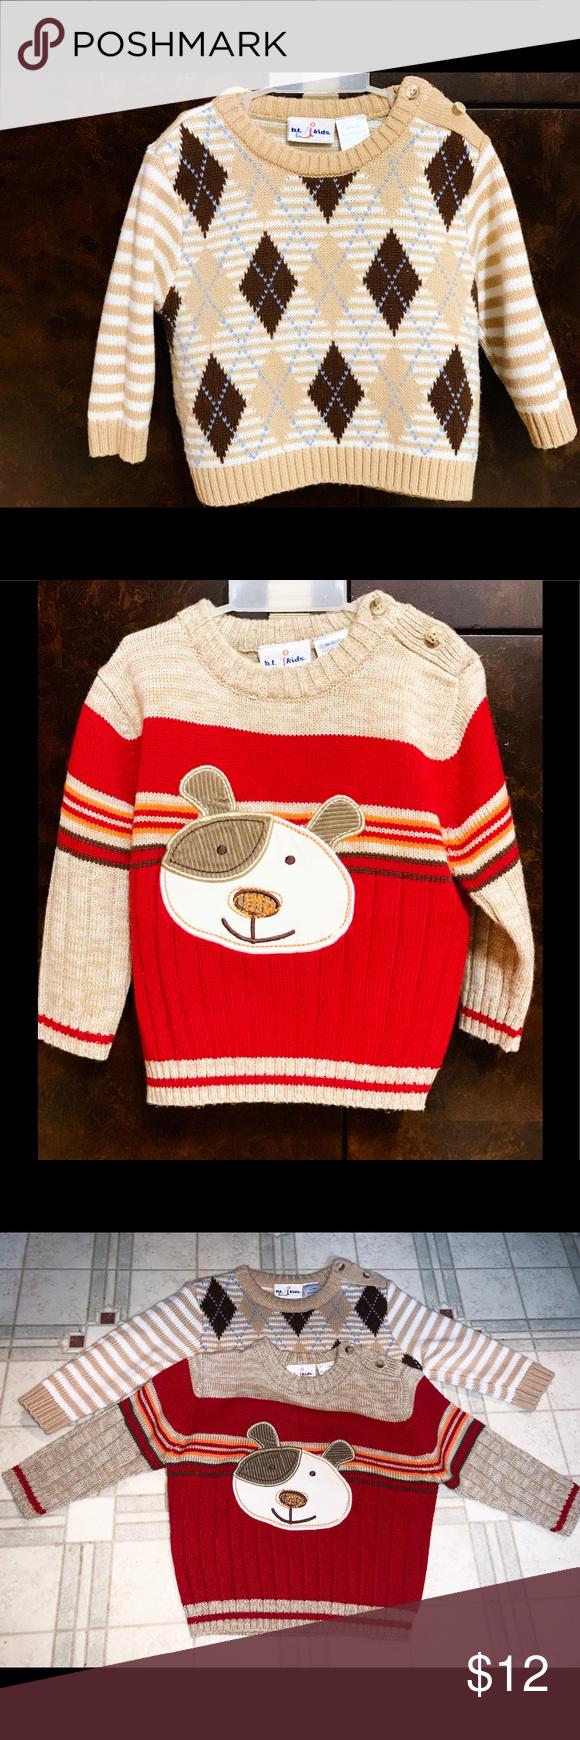 Bundle For 2 Bt Kids Sweaters Kids Sweater Sweaters Kids Shirts